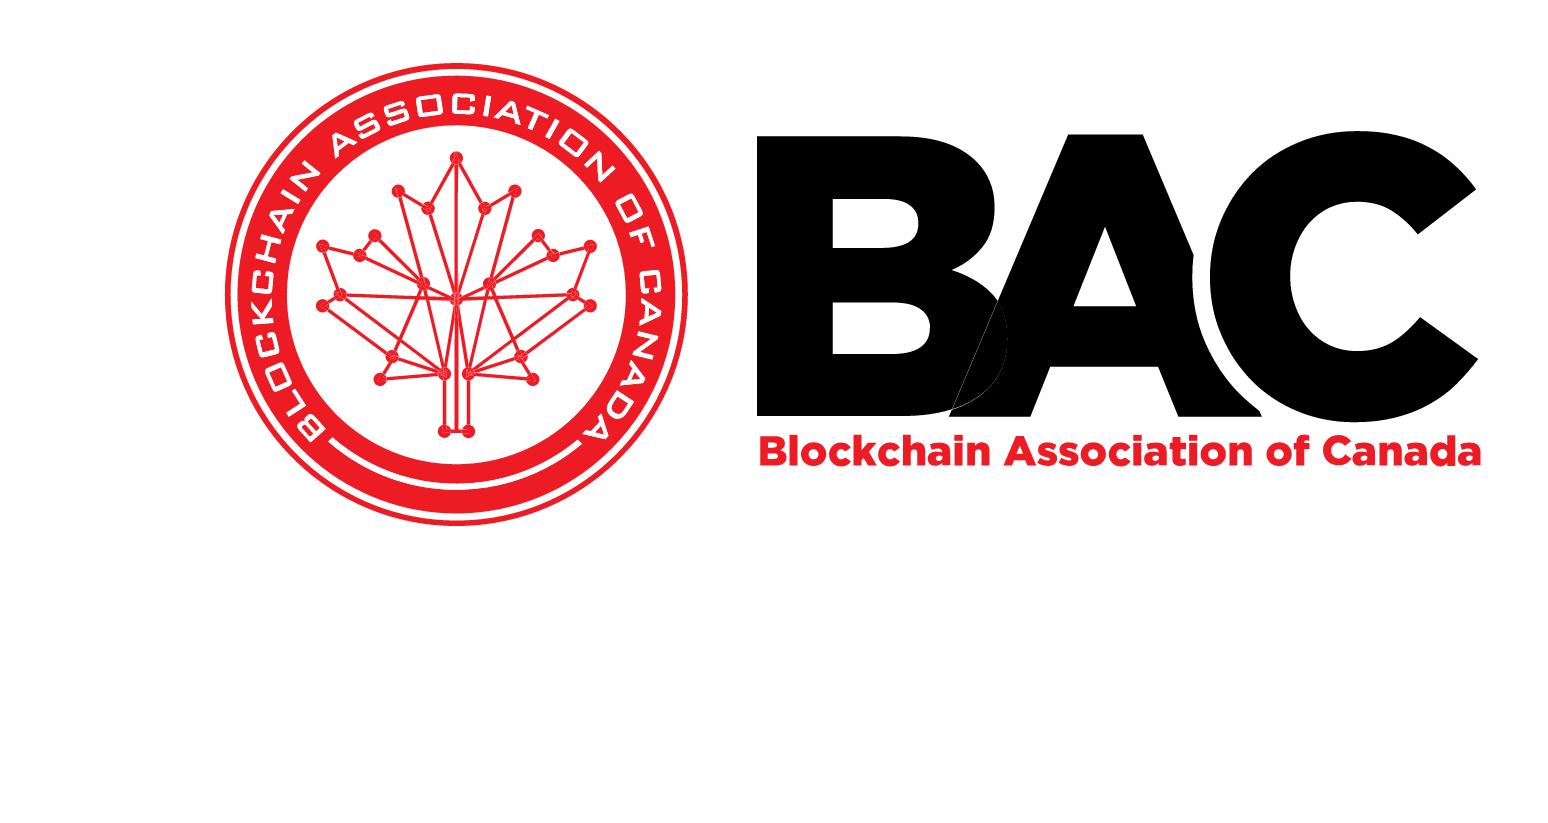 bitcoin alliance of canada)